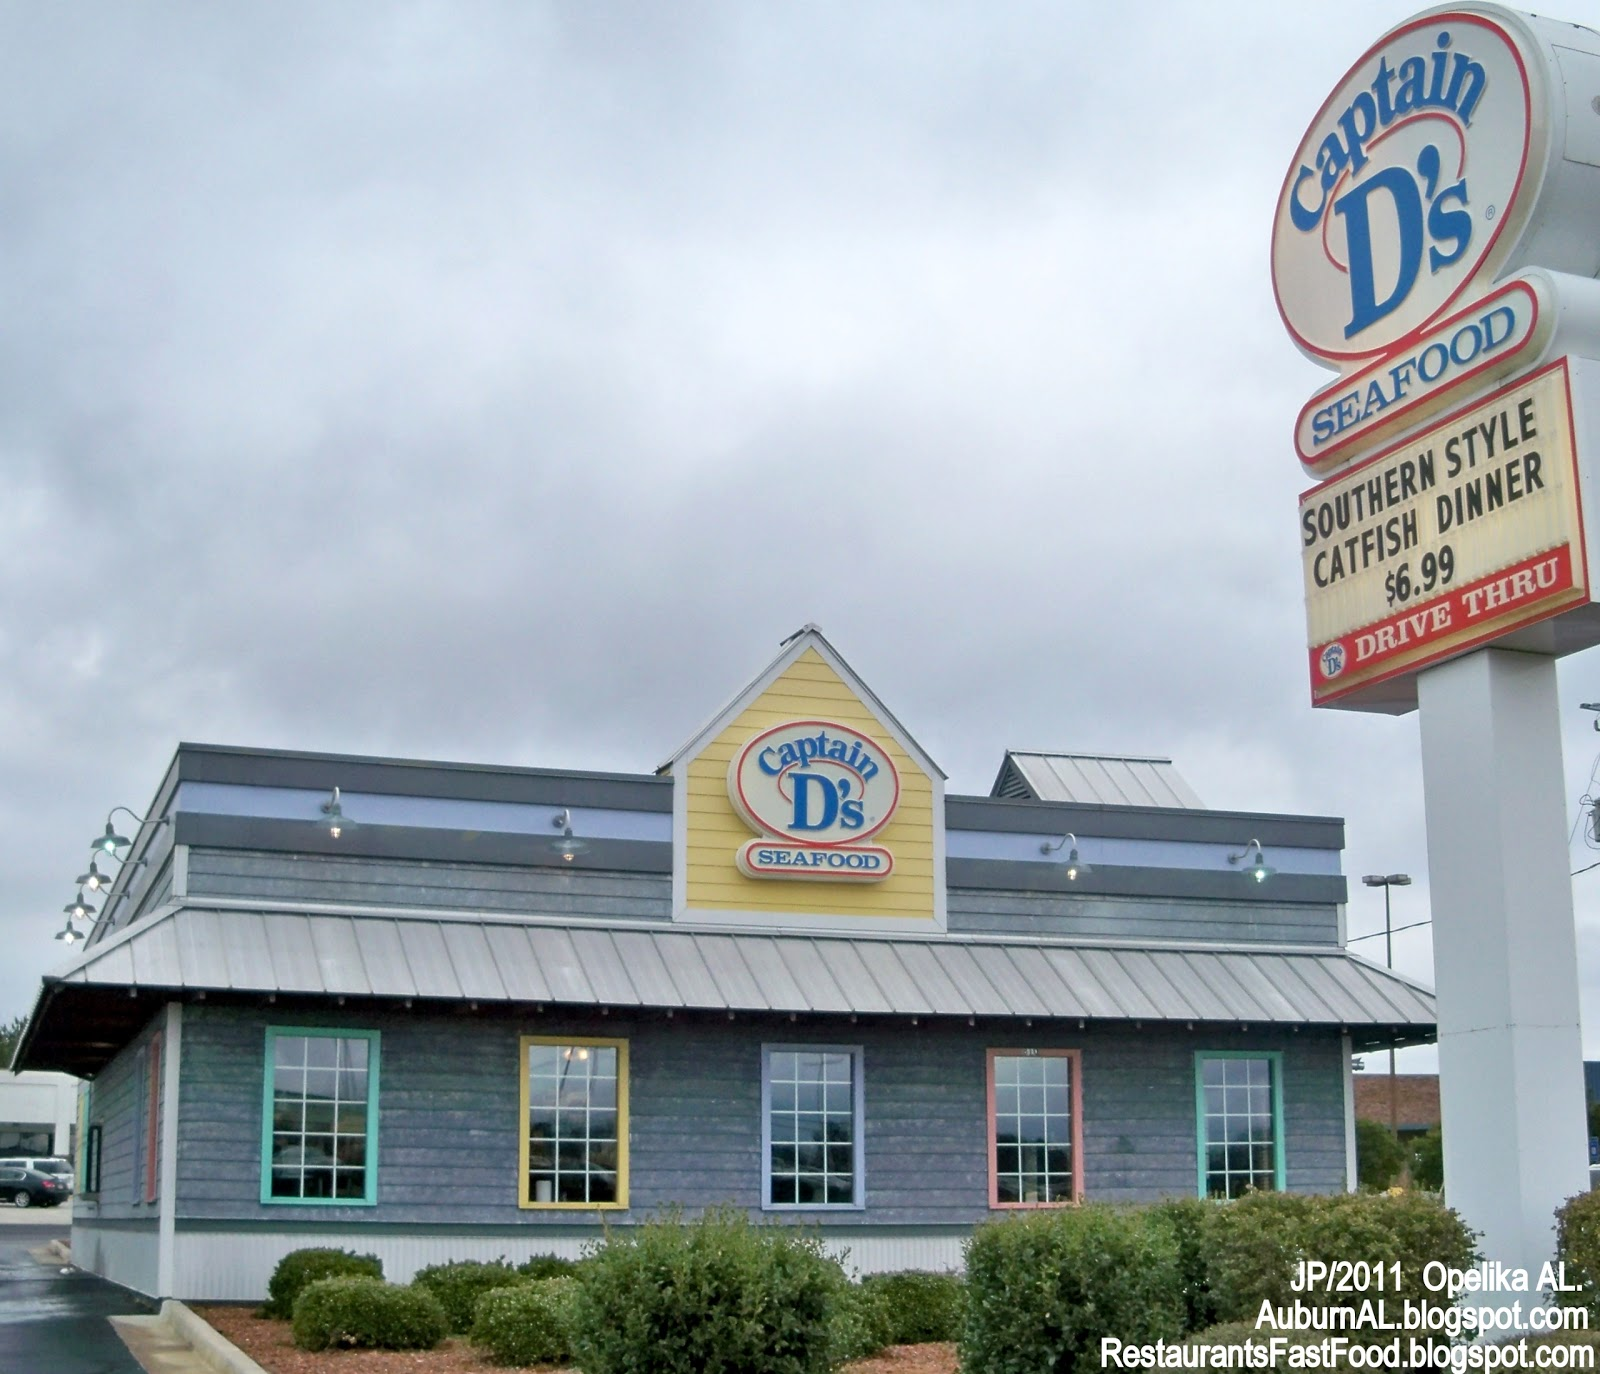 Auburn Alabama Opelika Lee University Restaurant Bank Drhospital